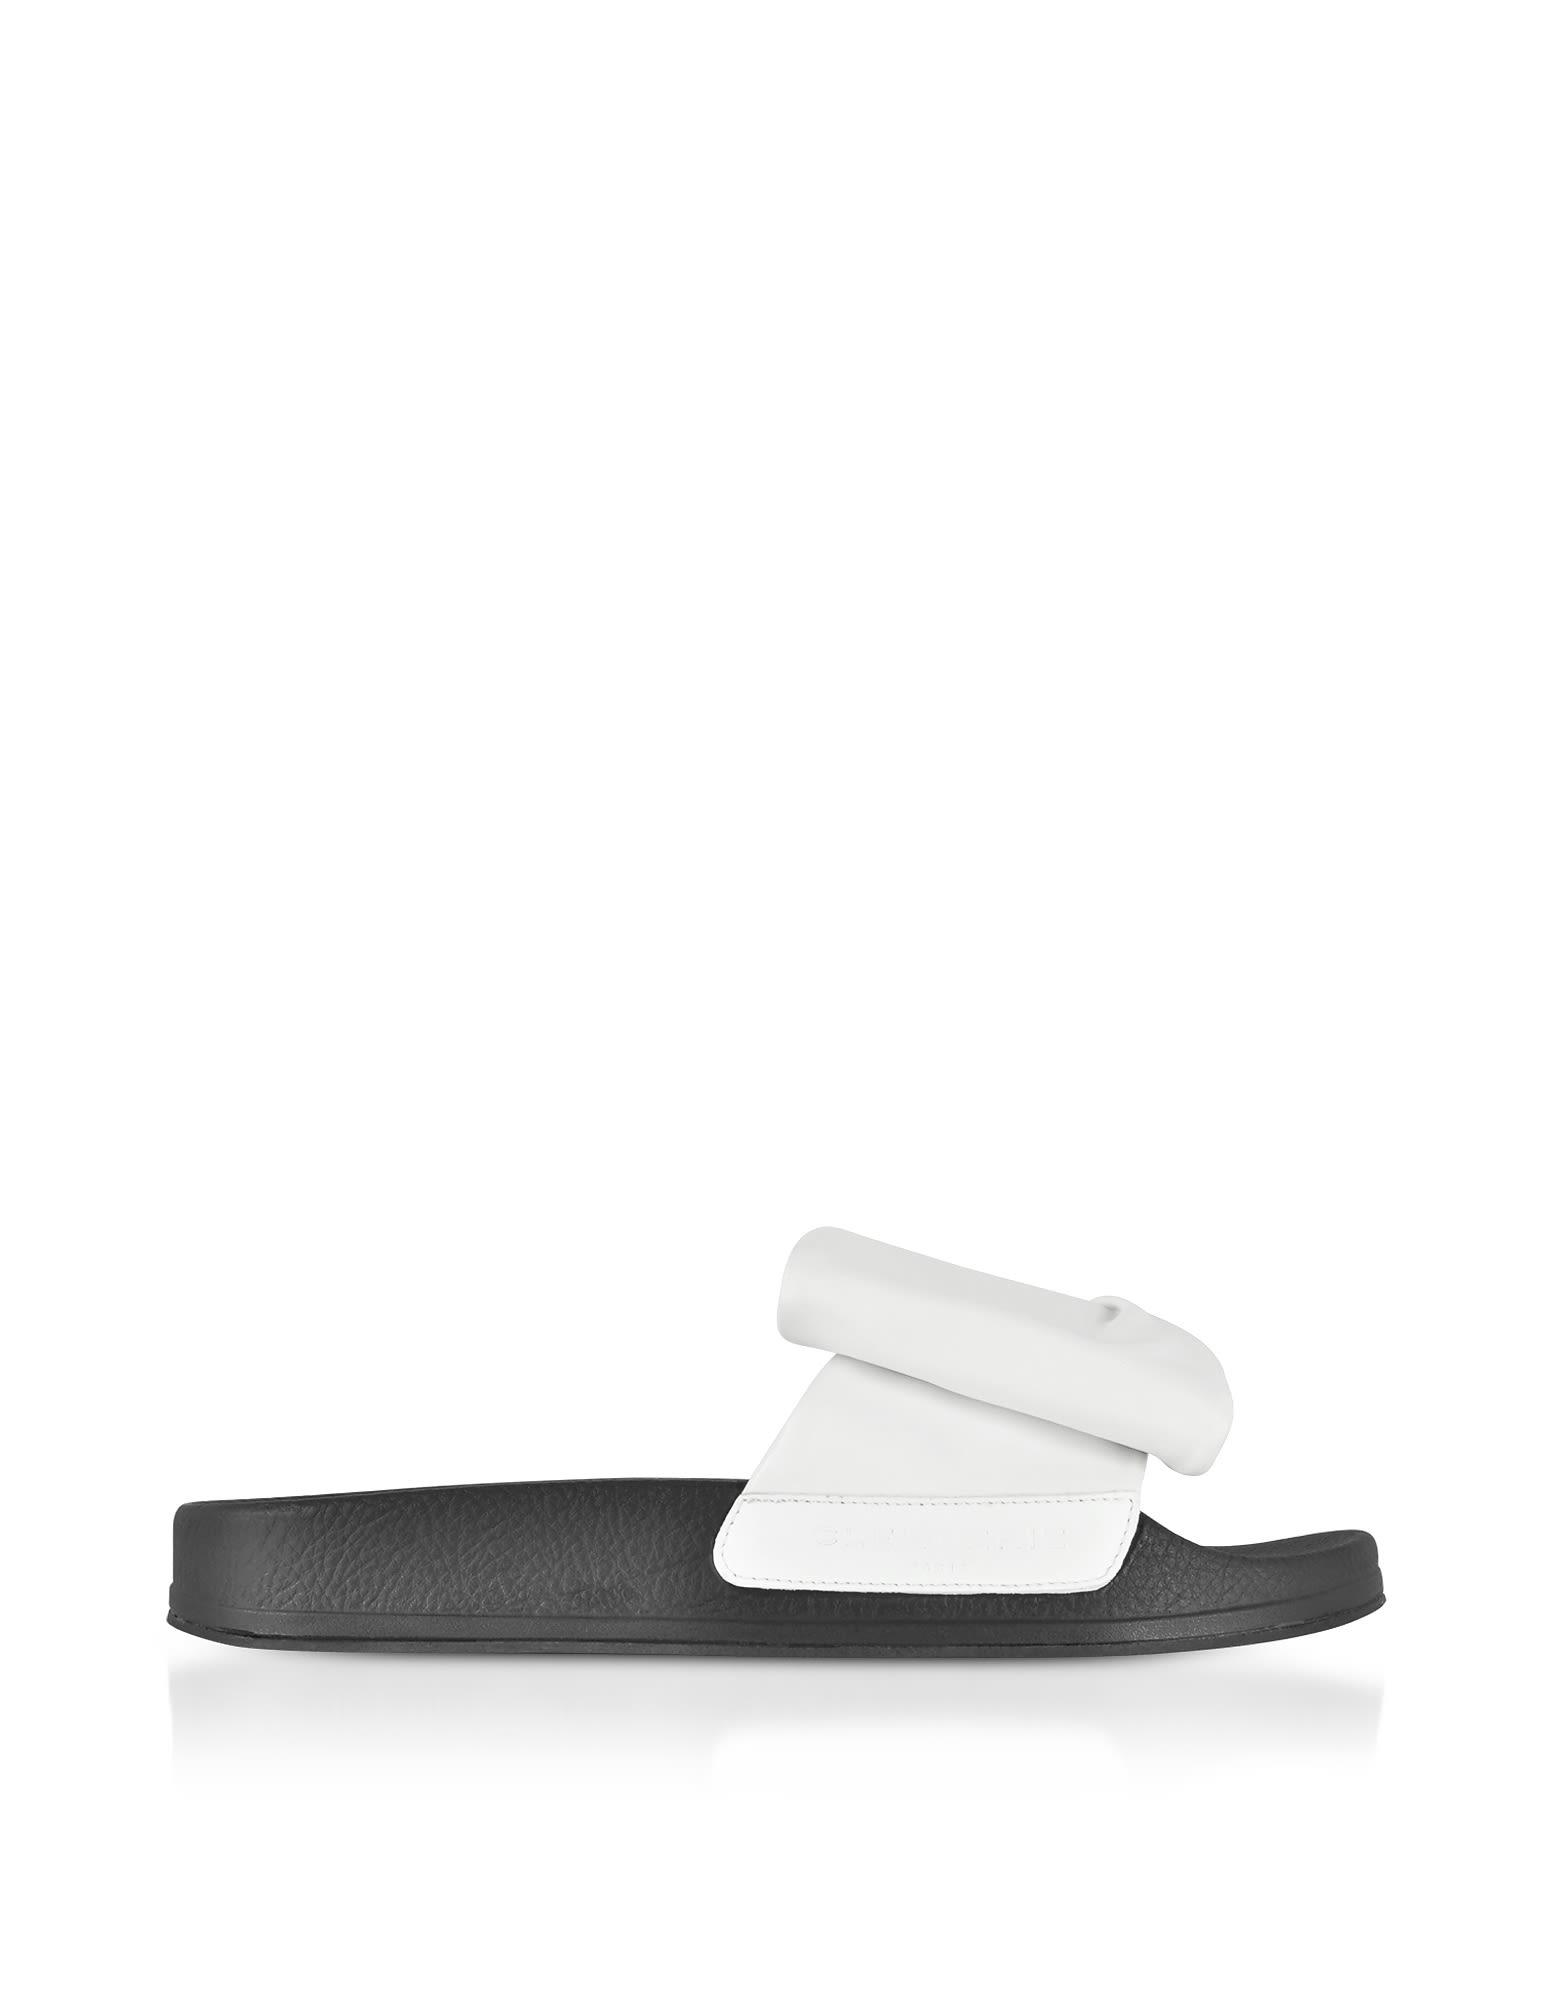 Robert Clergerie Designer Shoes, Wendy Leather Slide Sandals w/ Sole